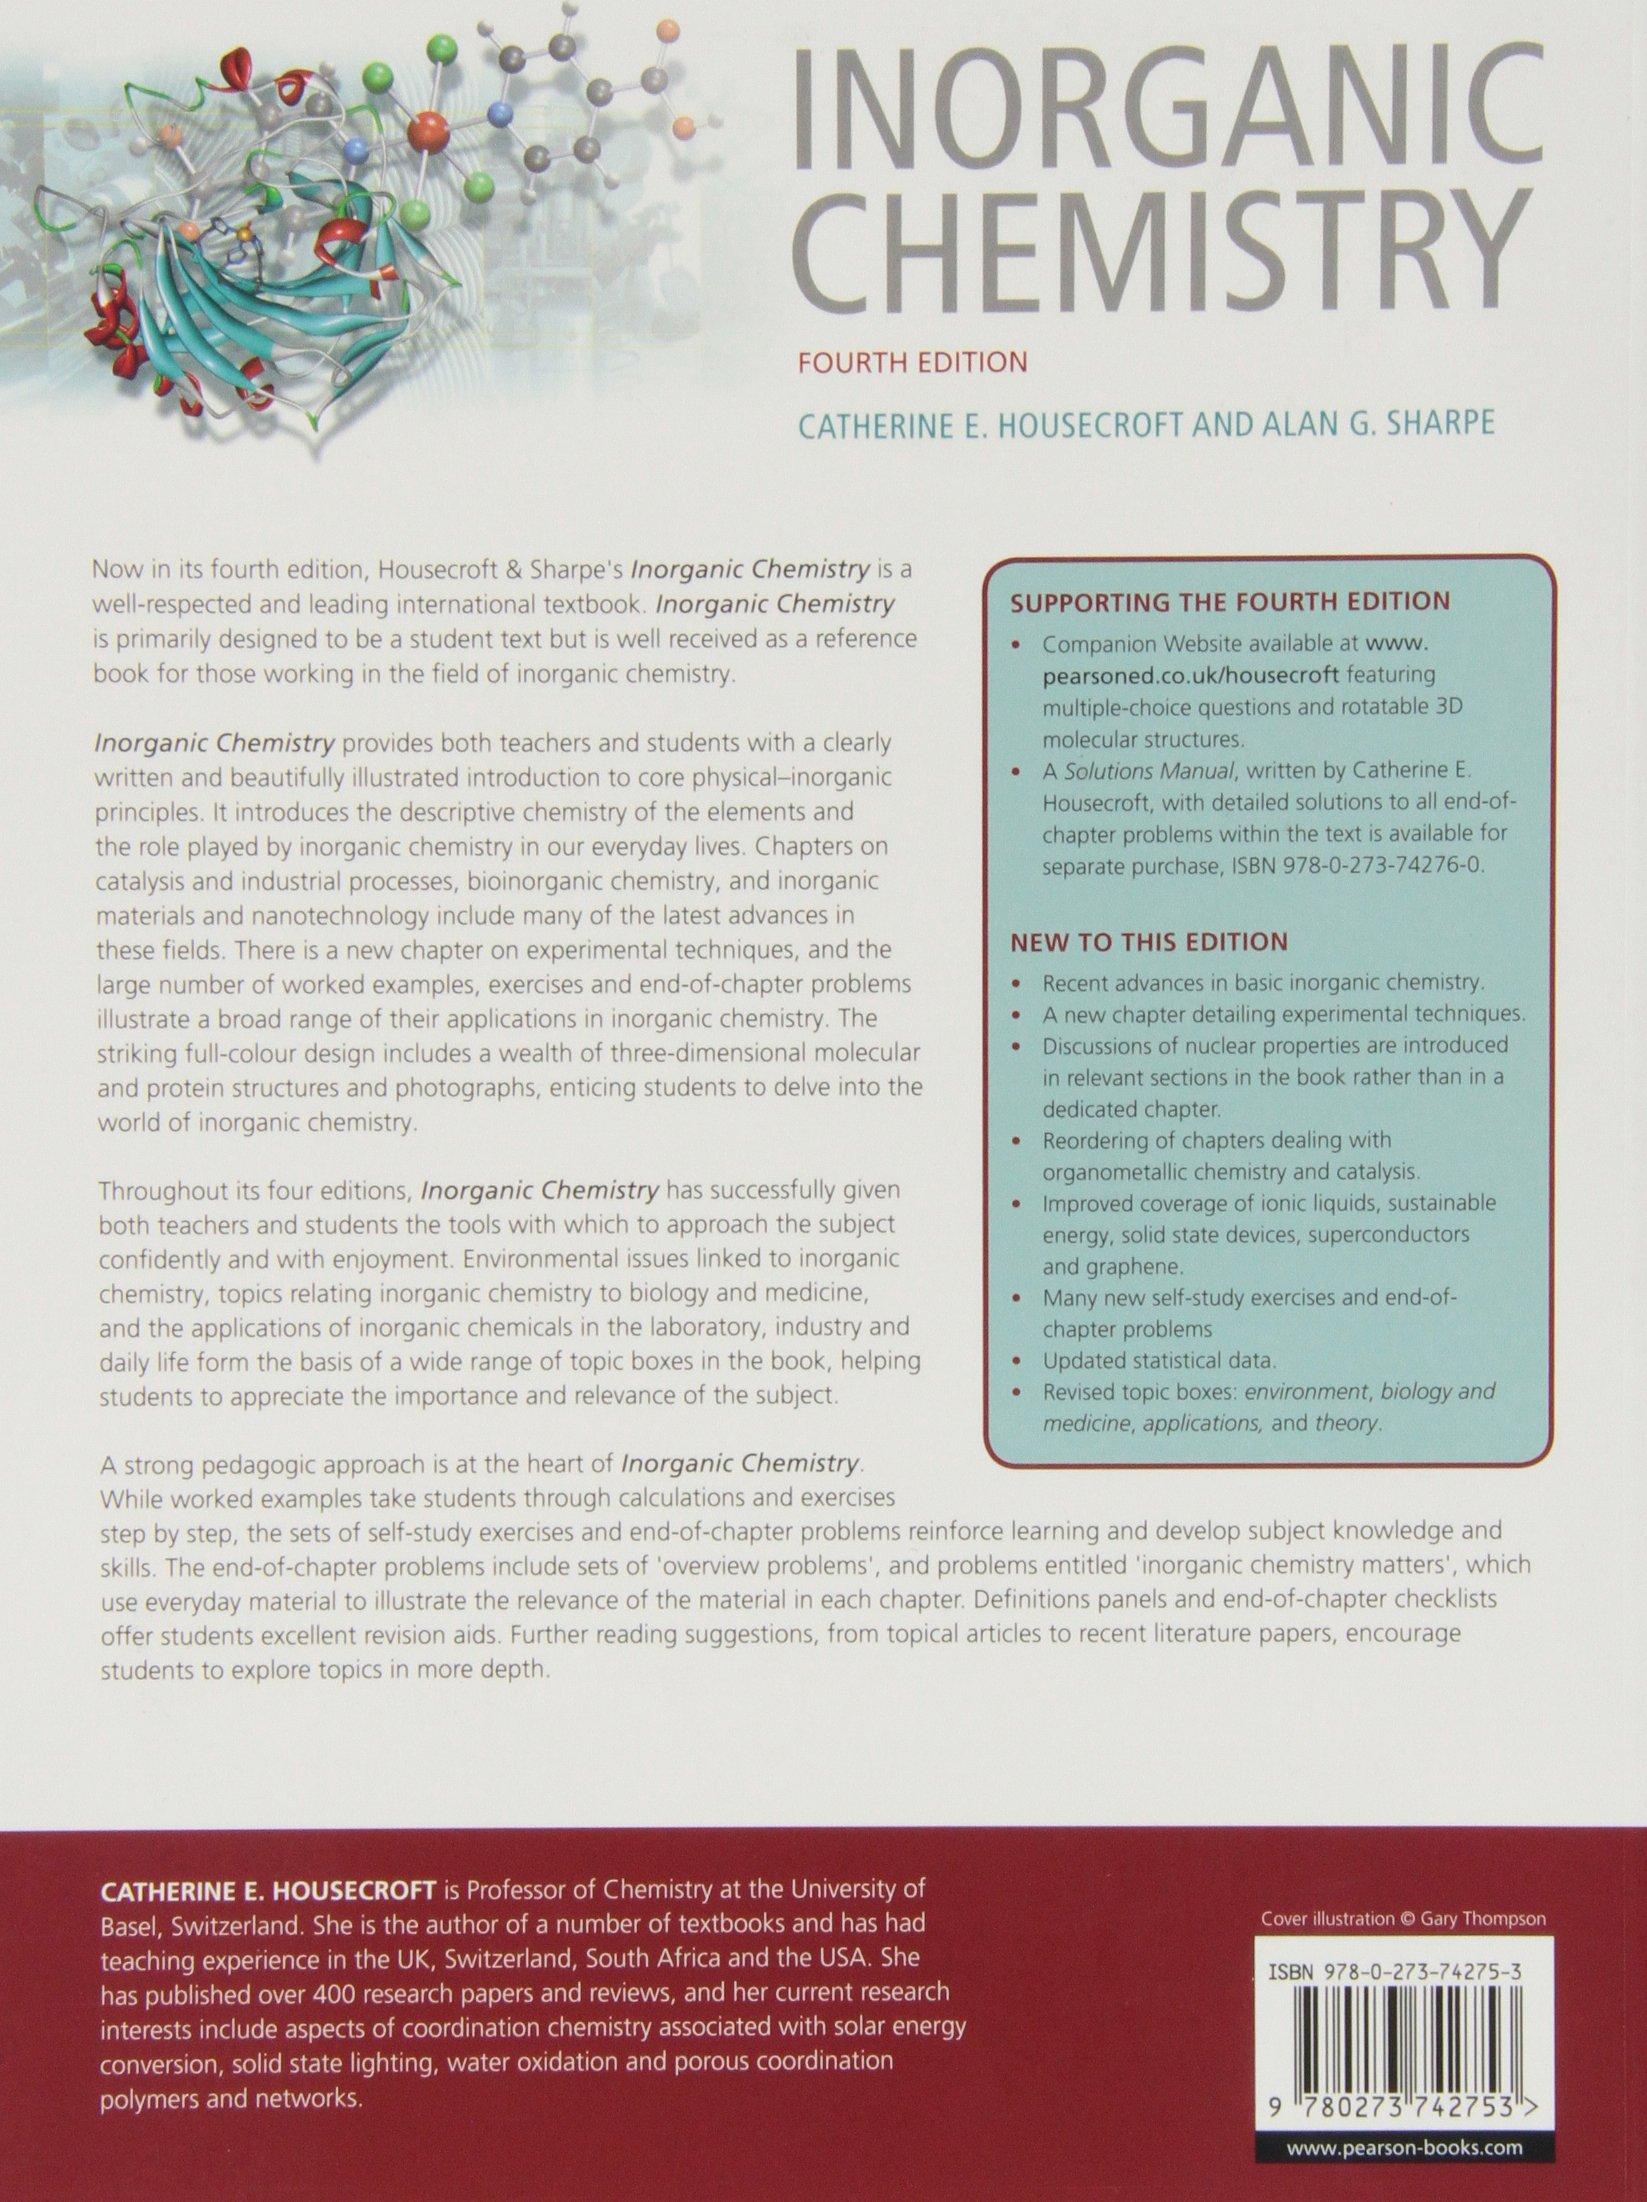 Inorganic Chemistry (4th Edition): Catherine Housecroft, Alan G. Sharpe:  9780273742753: Books - Amazon.ca